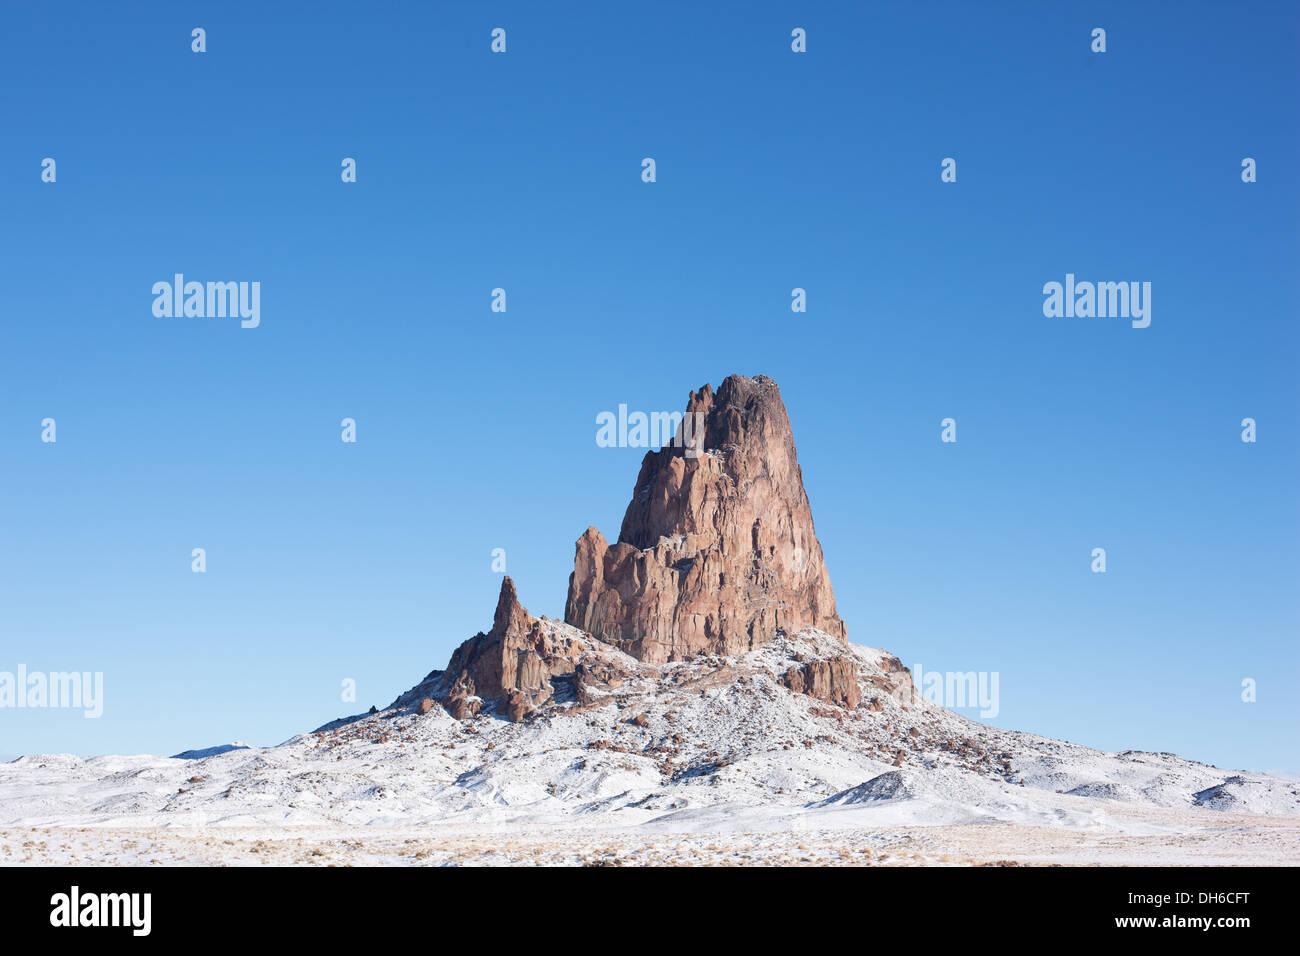 ISOLATED VOLCANIC NECK IN WINTER. El Capitan or Agathla Peak north of Kayenta, on Navajo Land, Northen Arizona, USA. - Stock Image